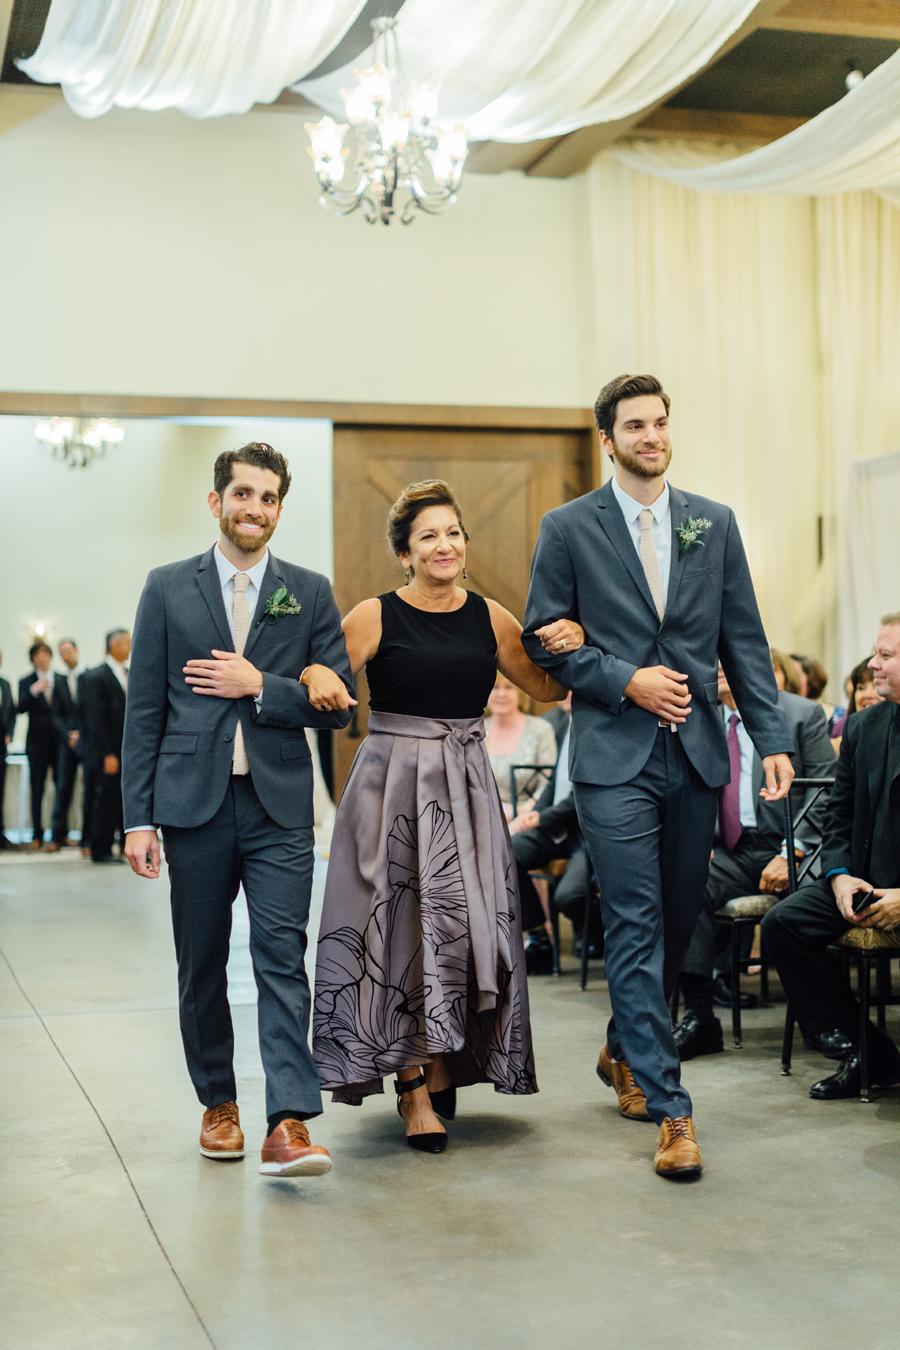 the-inn-at-leola-wedding-lancaster-pennsylvania-wedding-photographer-rebeka-viola-photograhy (53).jpg